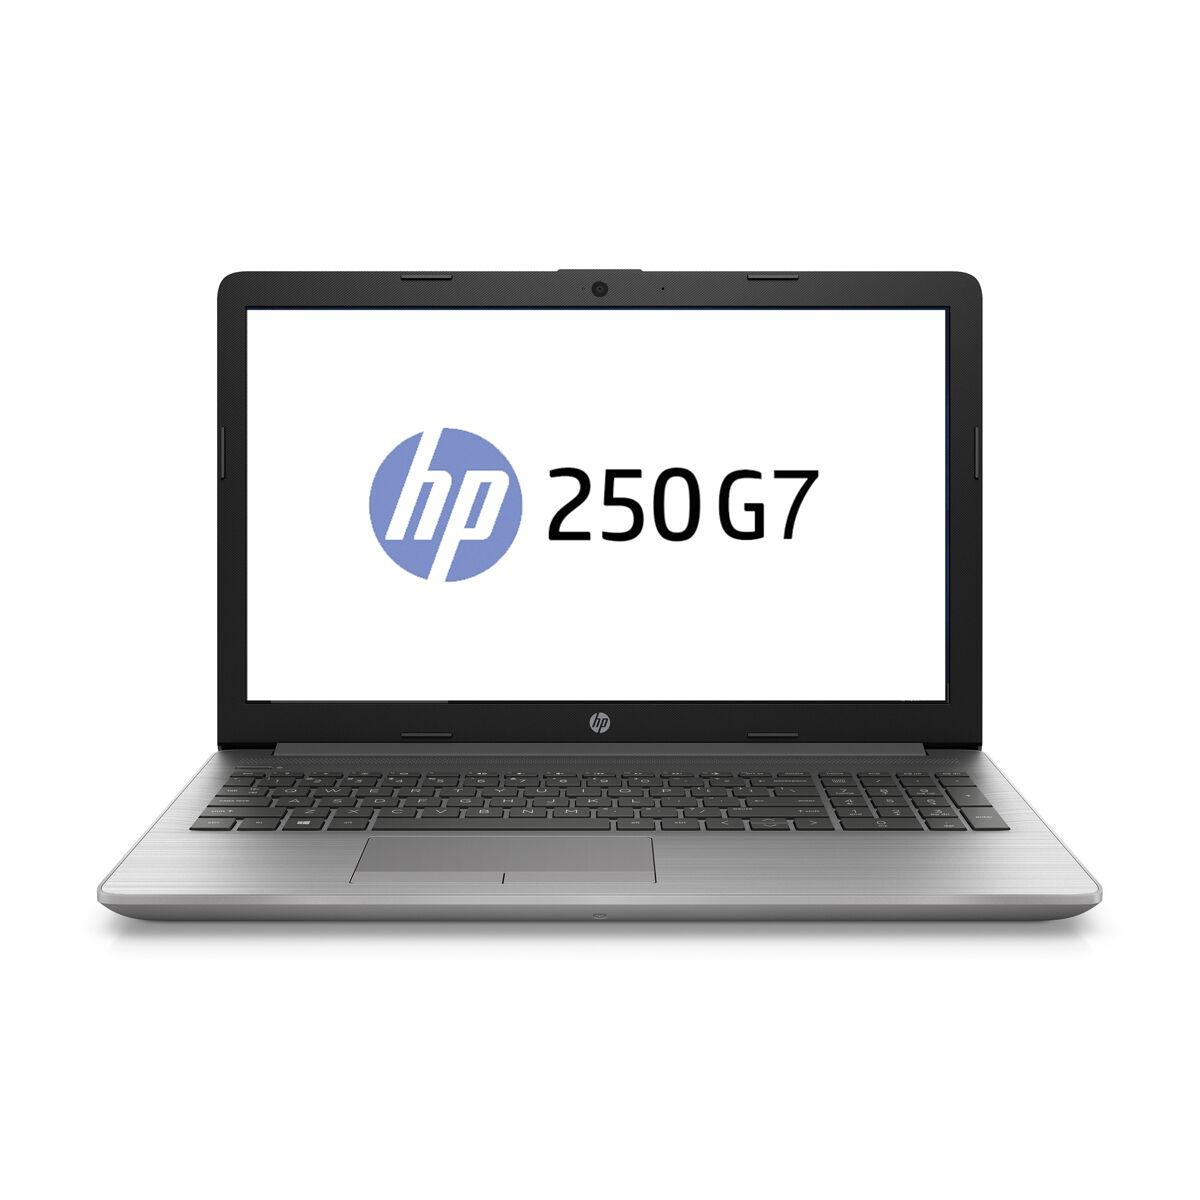 "Лаптоп HP 250 G7, Intel Core i3-1005G1, 8GB DDR4, 256Gb SSD NVMEe, DVD-RW, Full HD 15.6"", Сребрист"